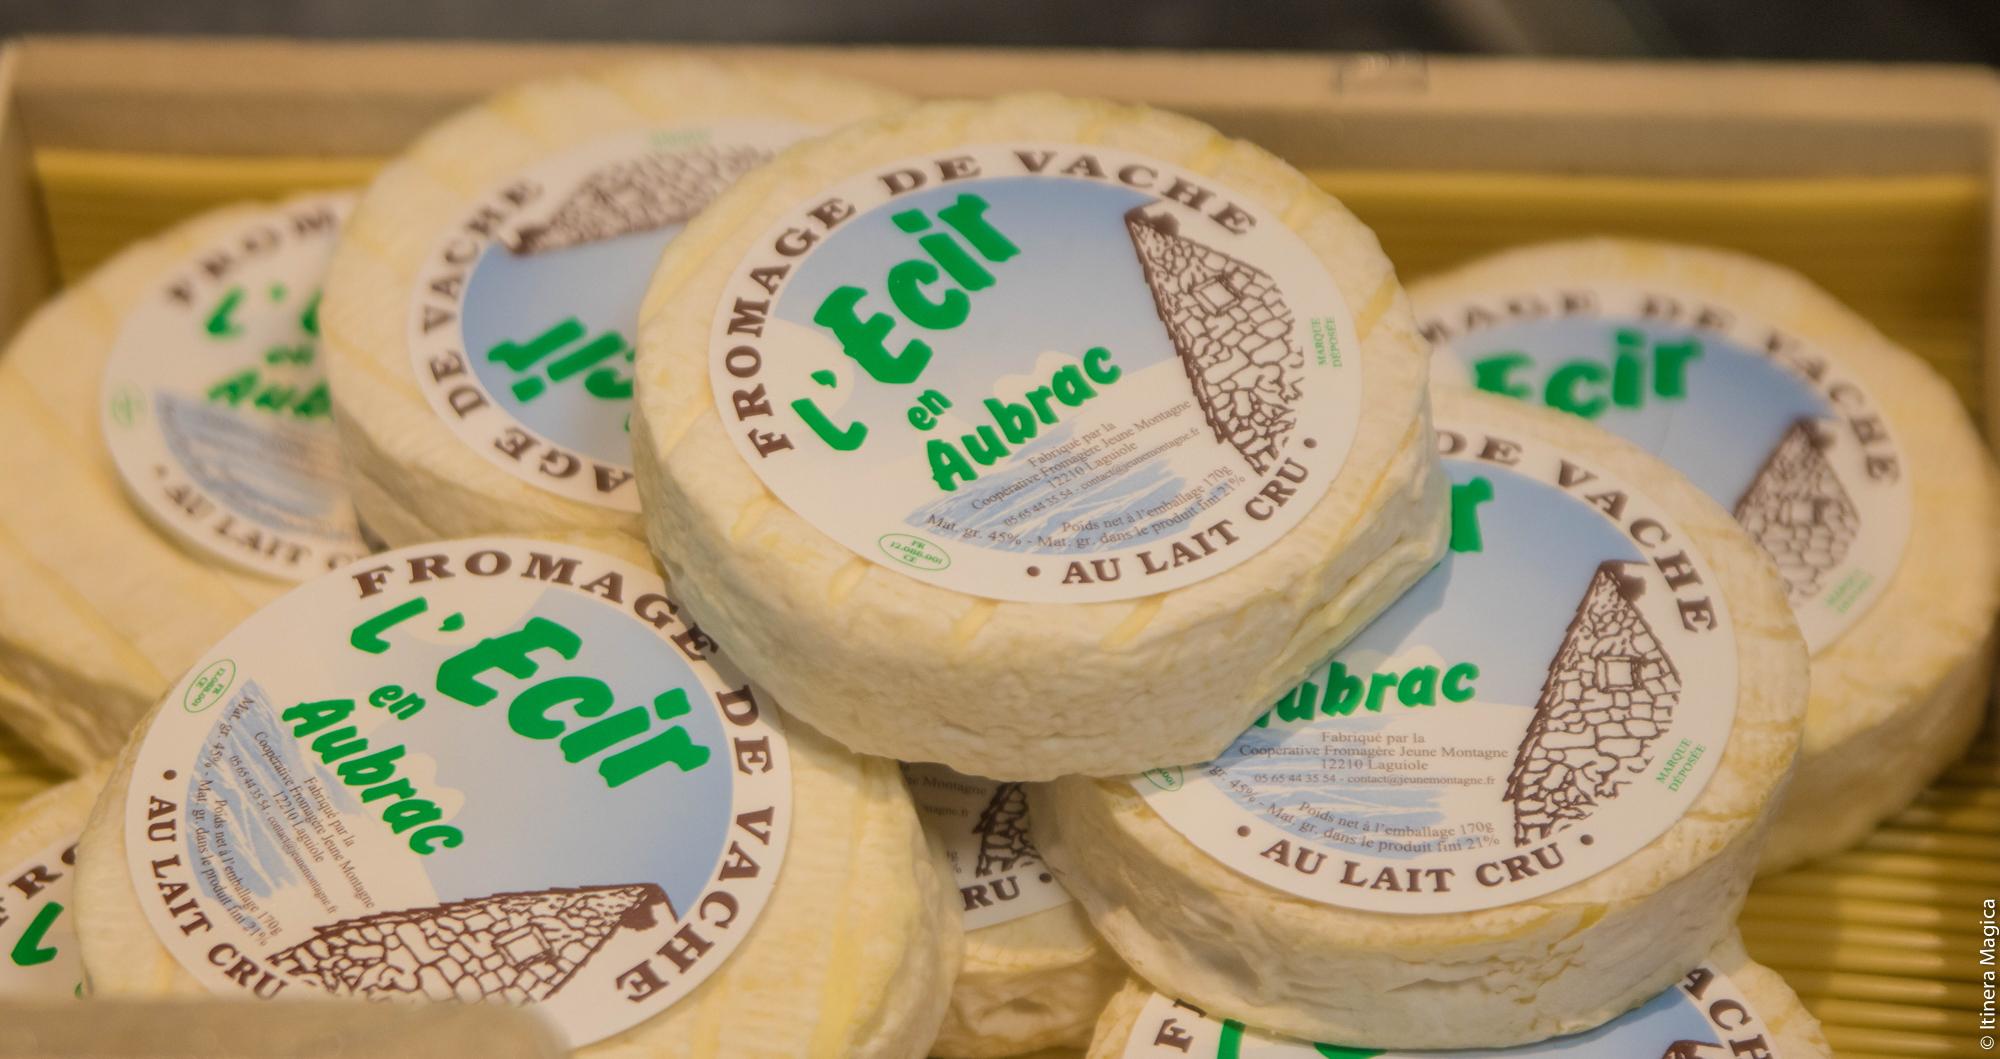 L'Ecir, fromage de l'Aveyron © Itinera Magica